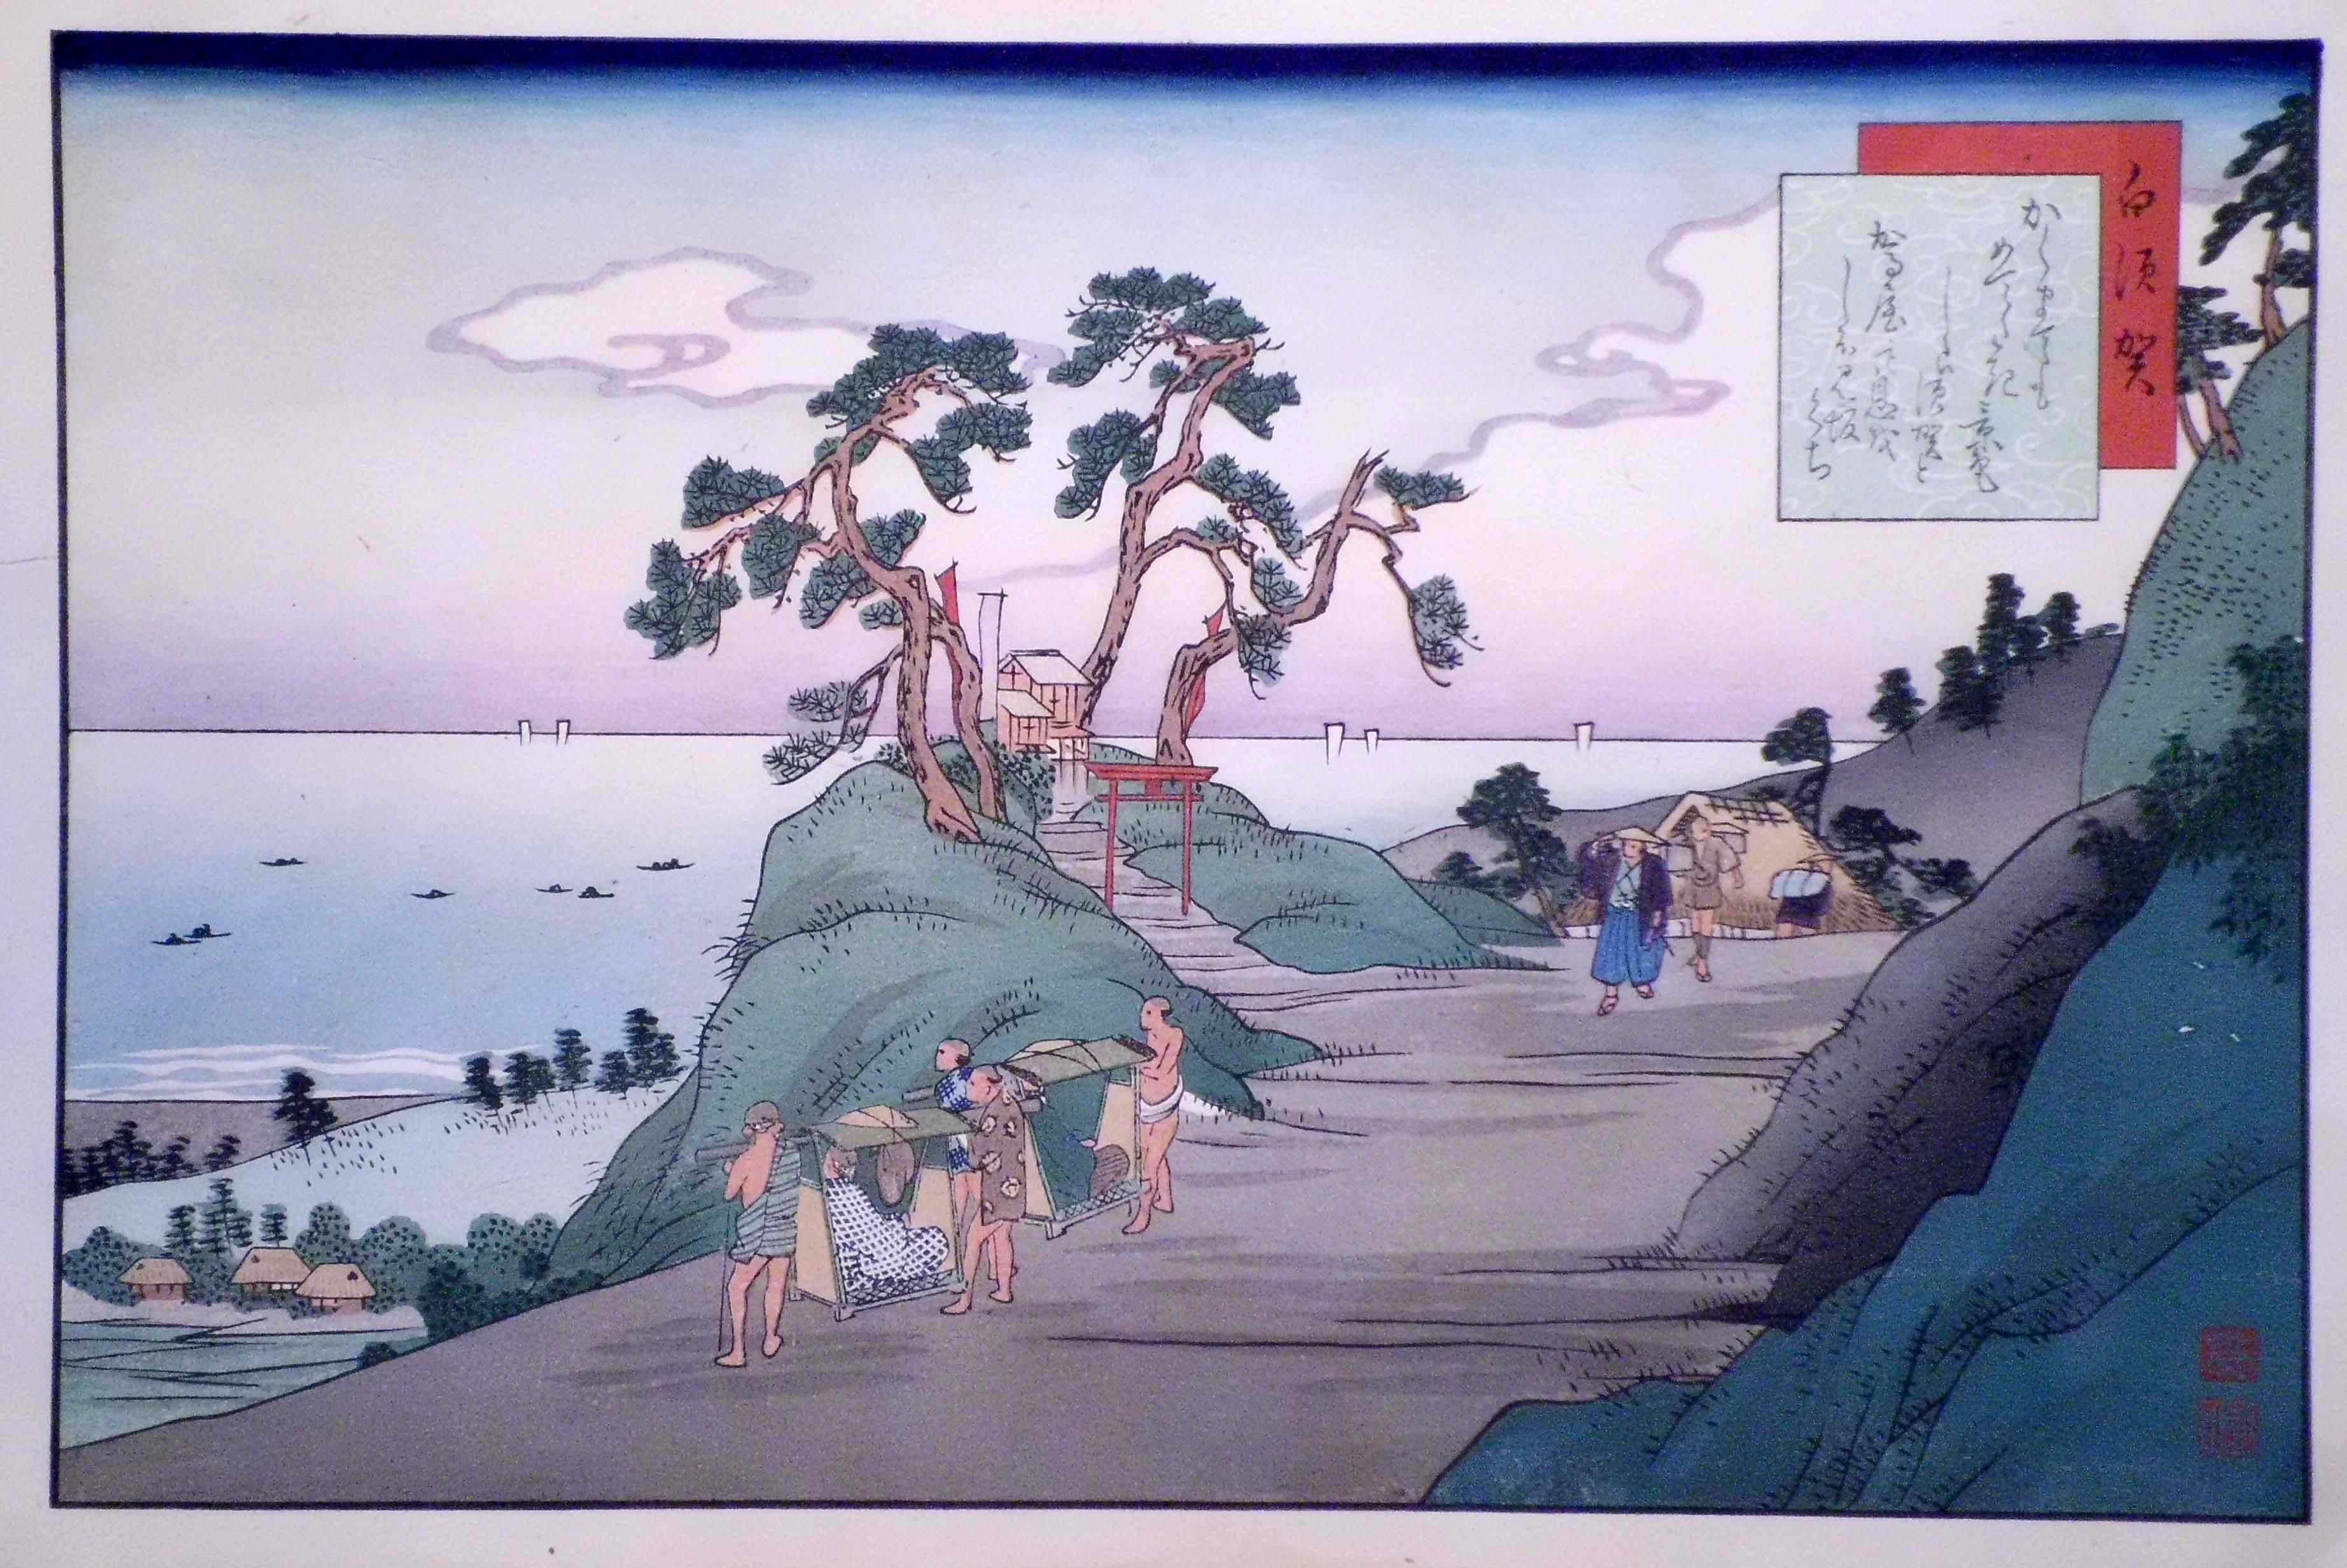 Fujikawa TAMENOBU (attivo nel 1890/1914) – SHIRASUKA, TRENTADUESIMA STAZIONE DELLA TOKAIDO